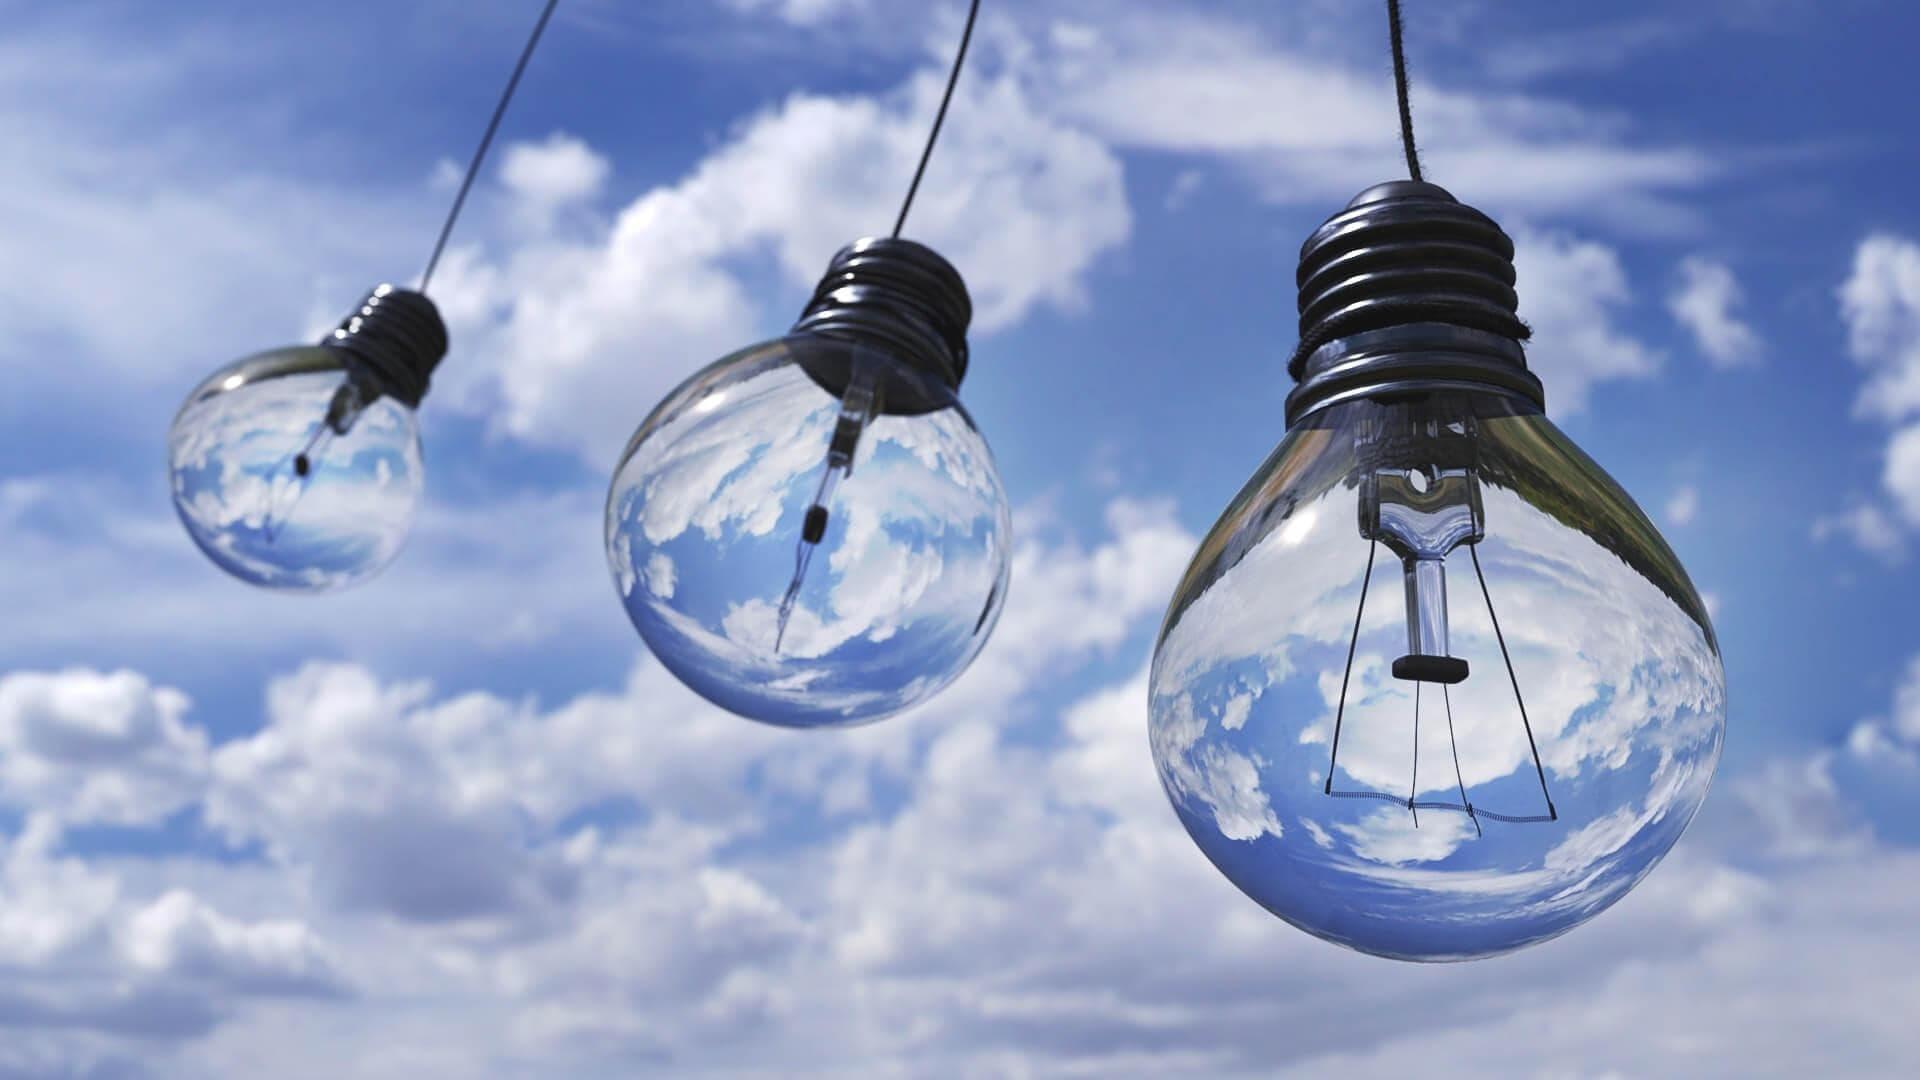 tre lampadine appese